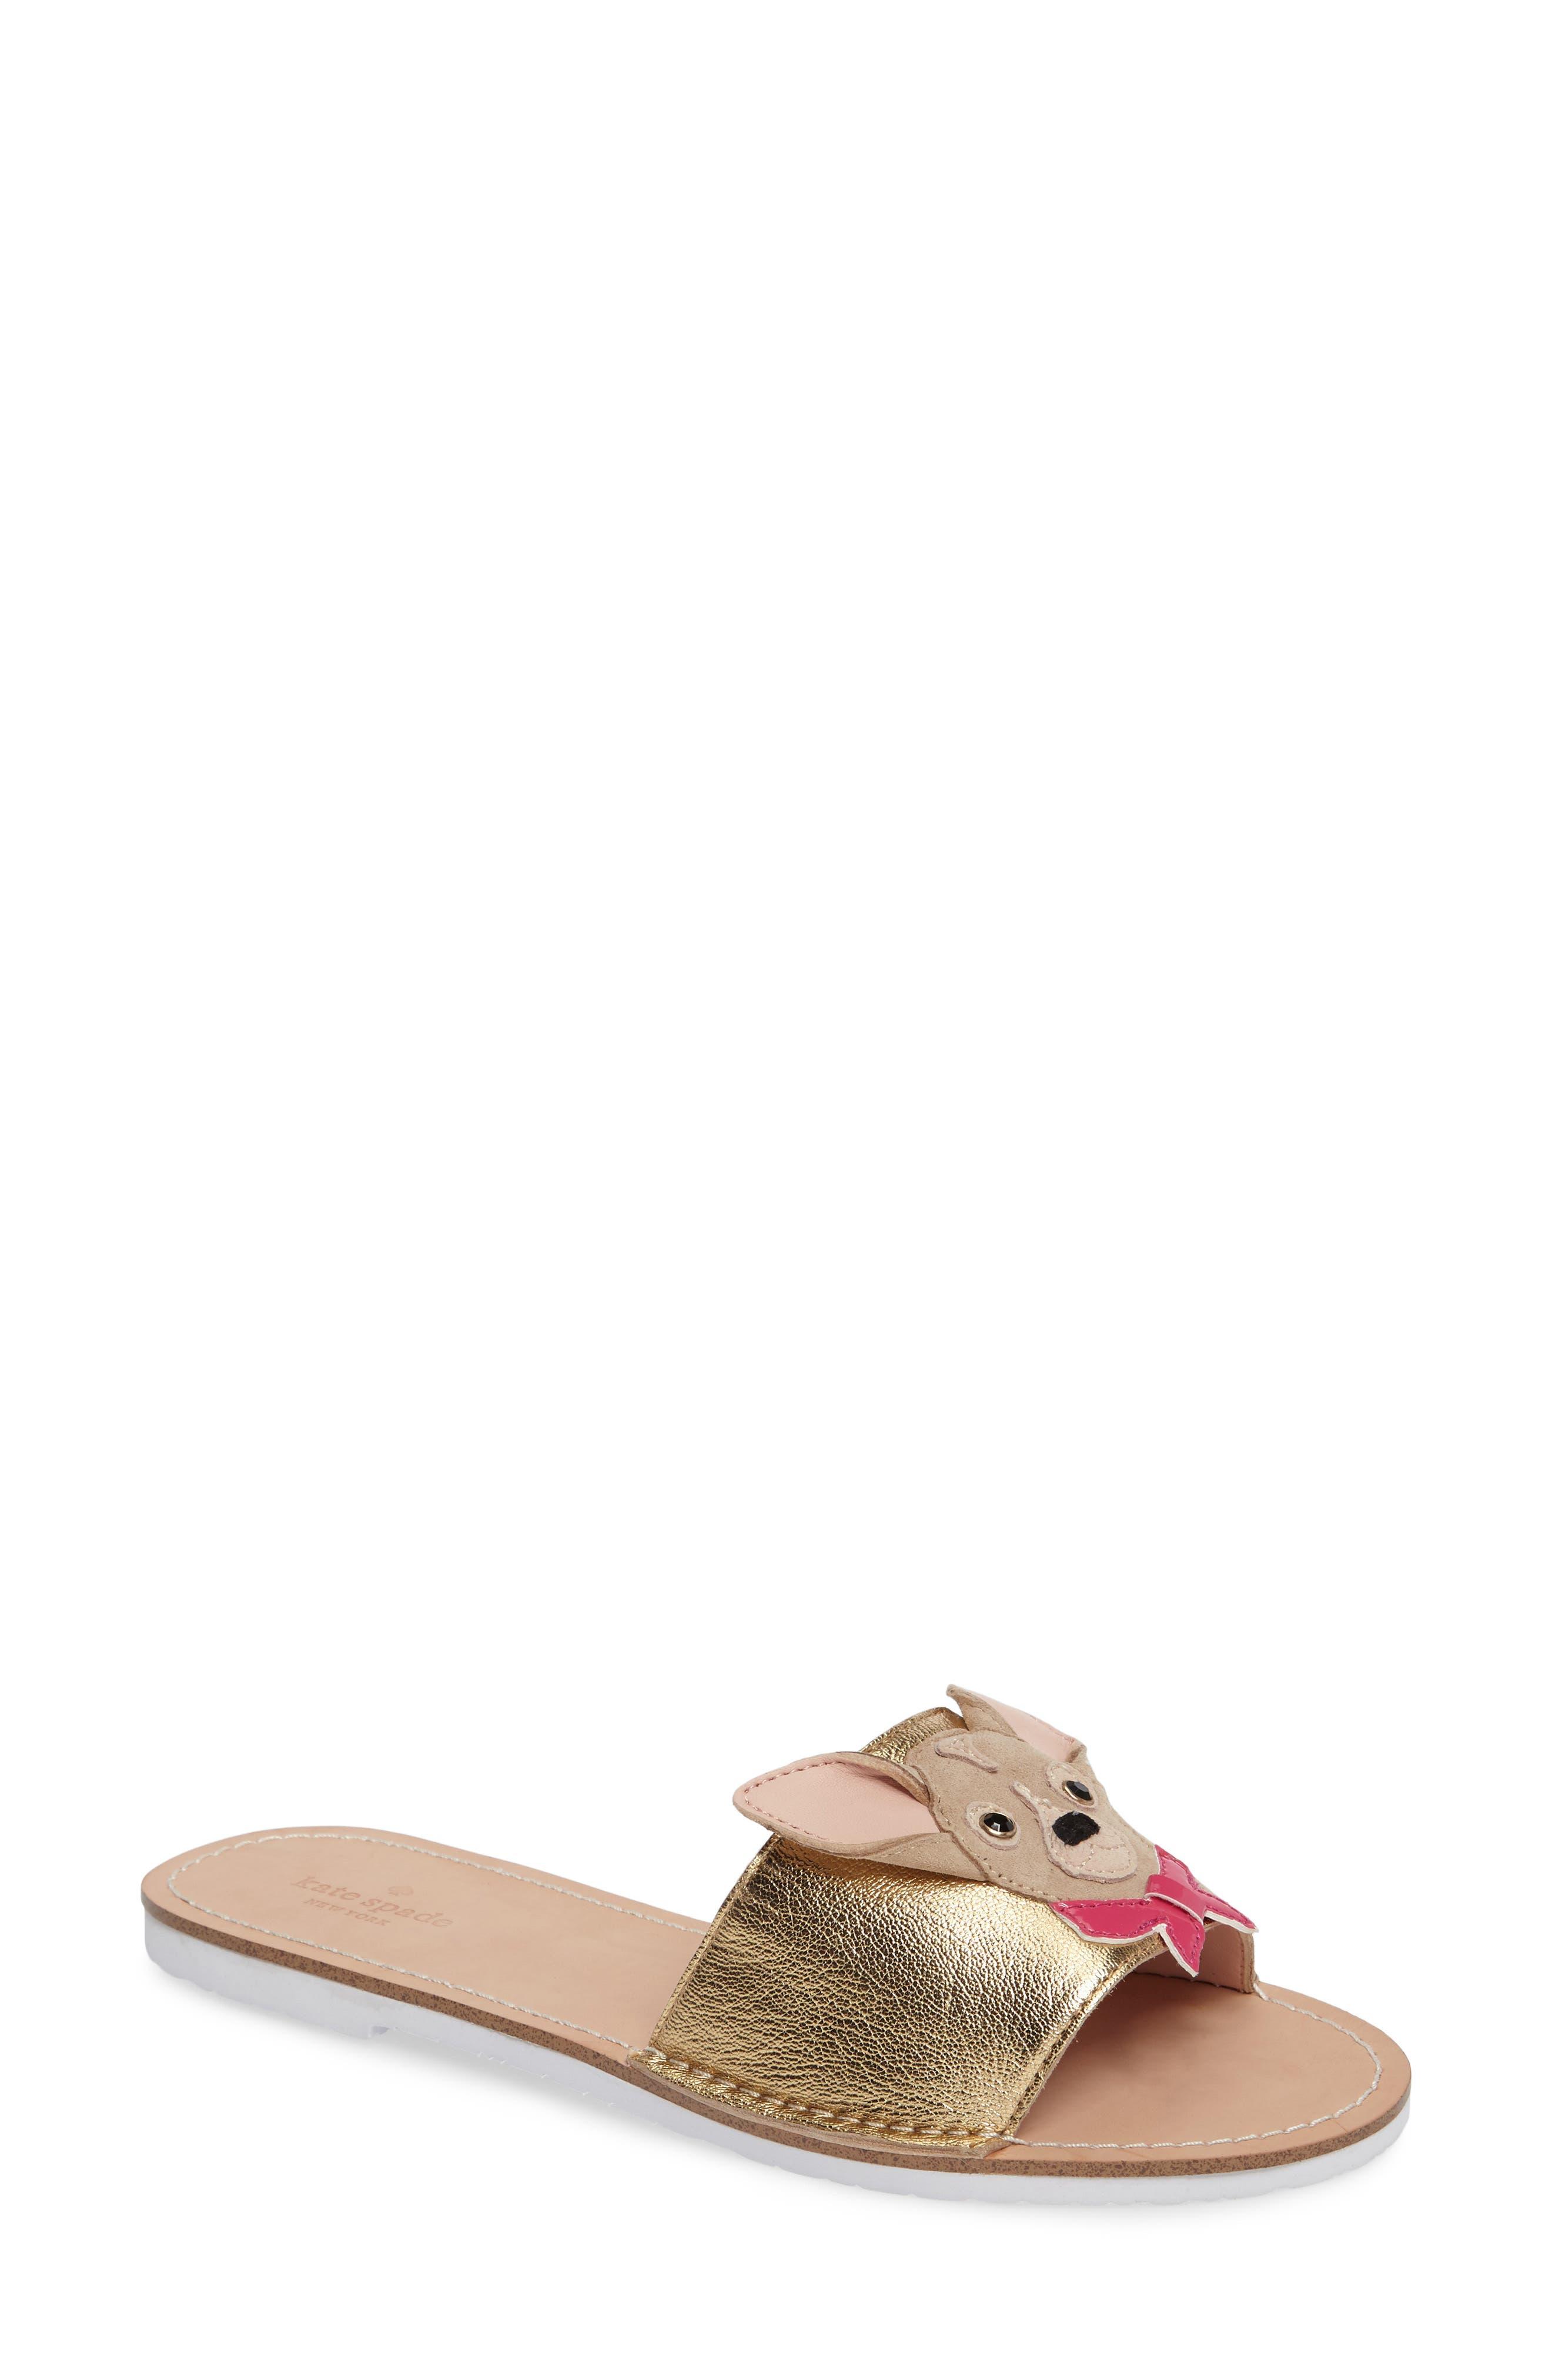 Main Image - kate spade new york isadore chihuahua slide sandal (Women)